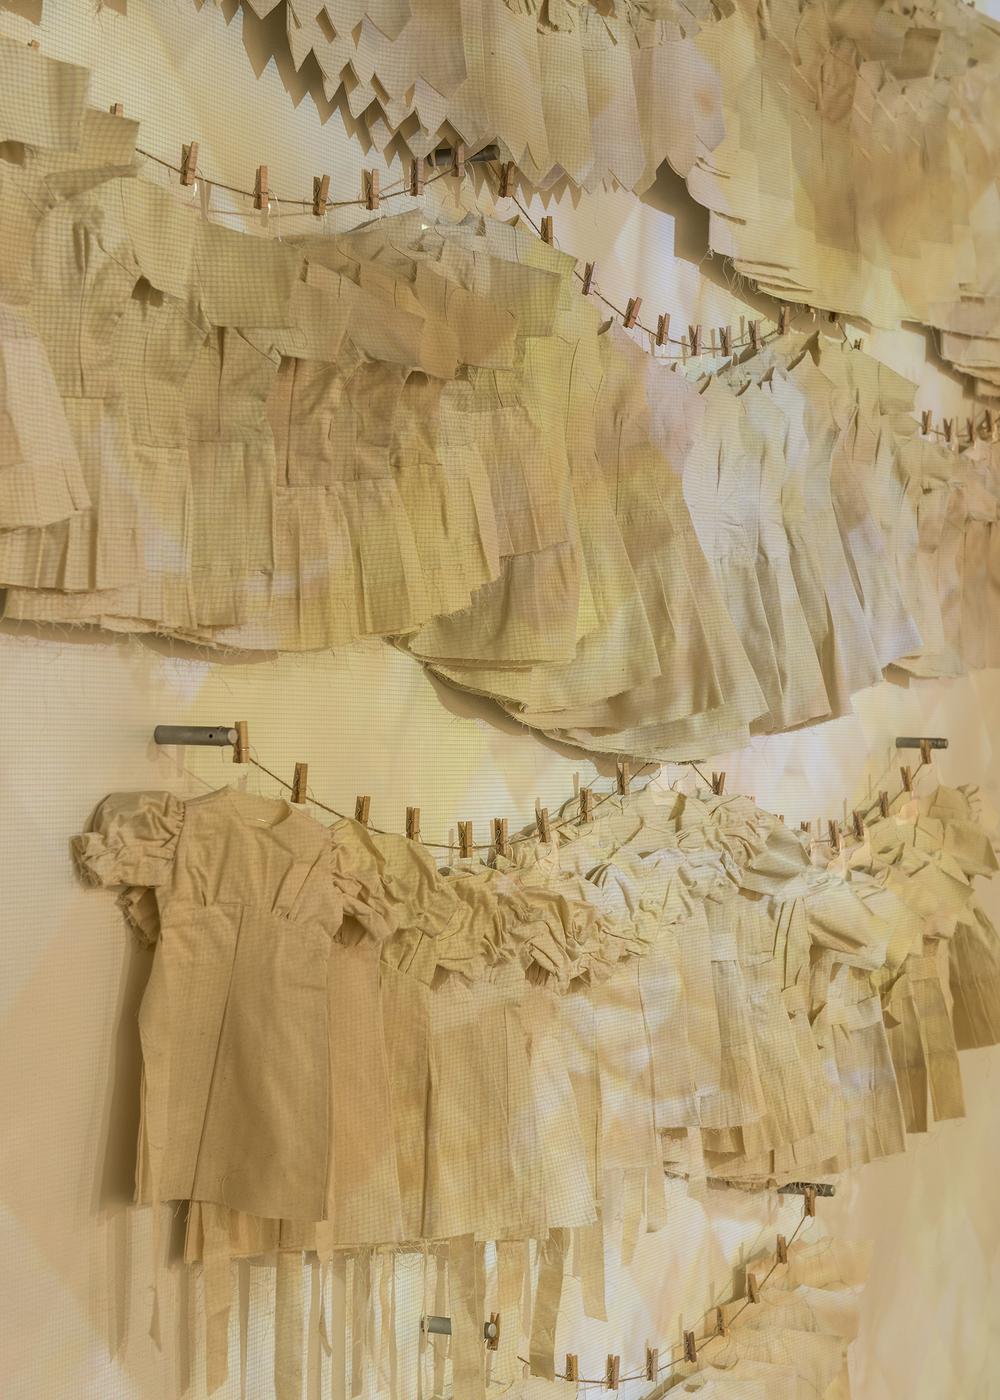 Dress-ups (detail)